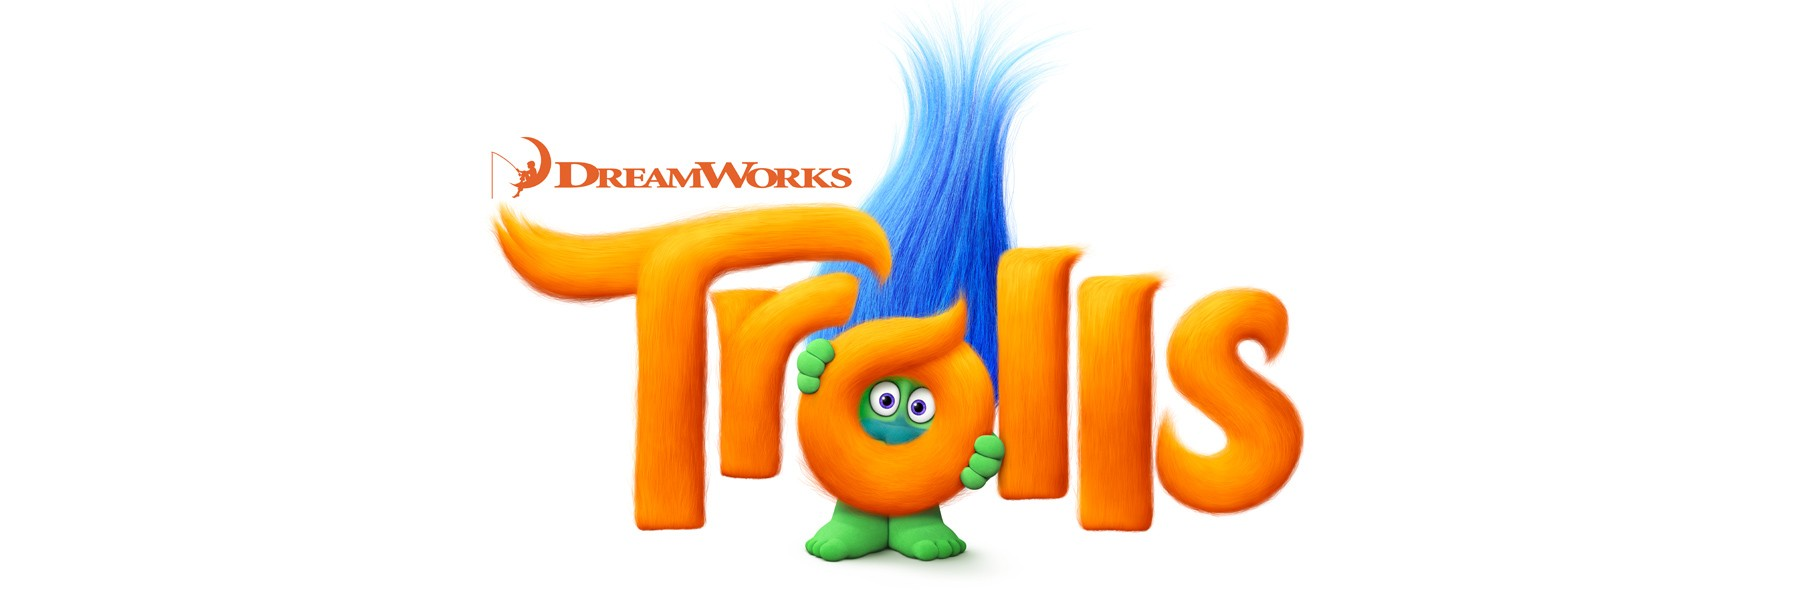 Trolls Logos.